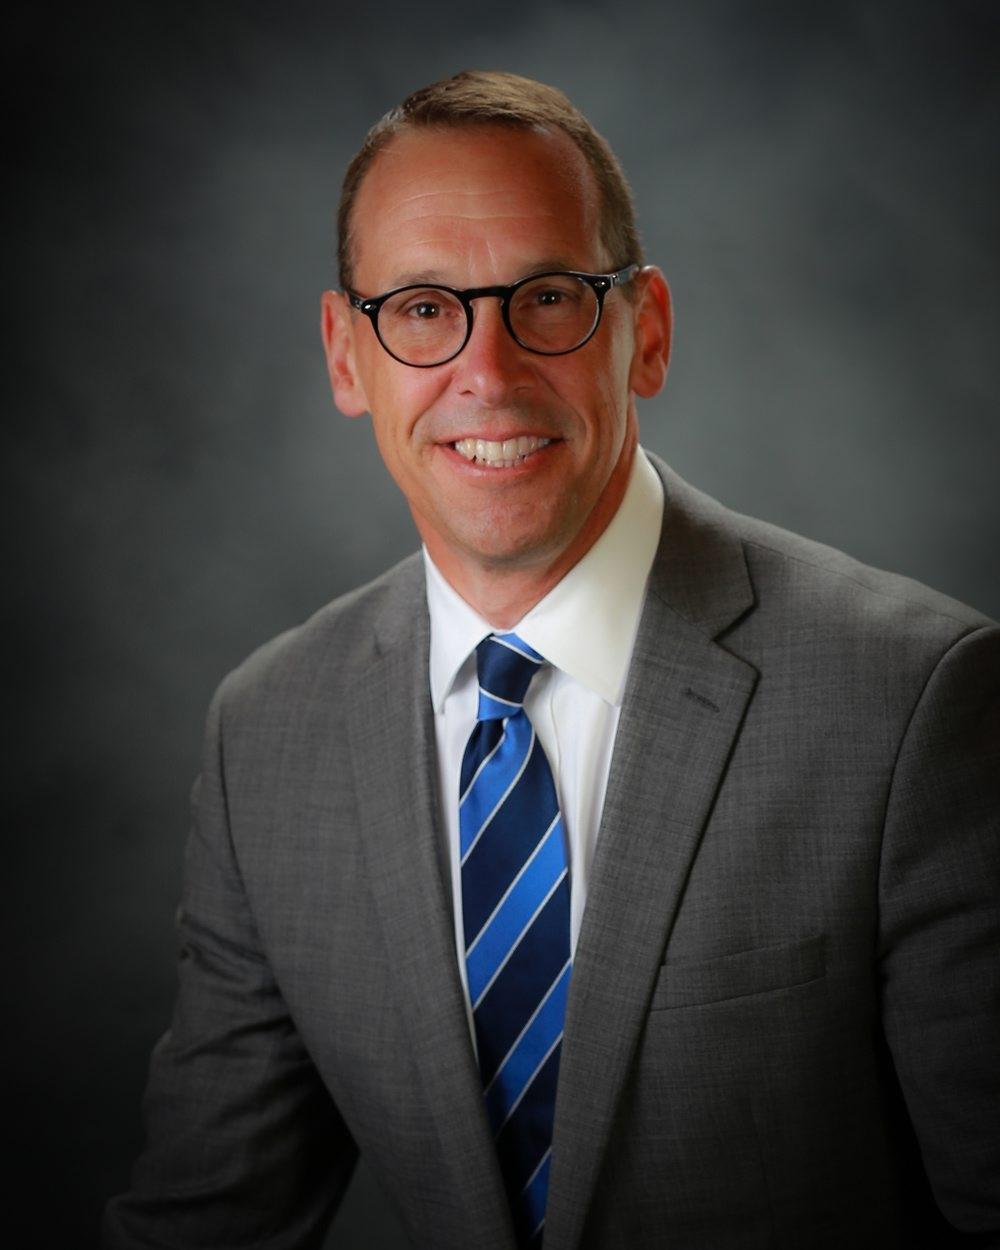 County District Attorney David Foley